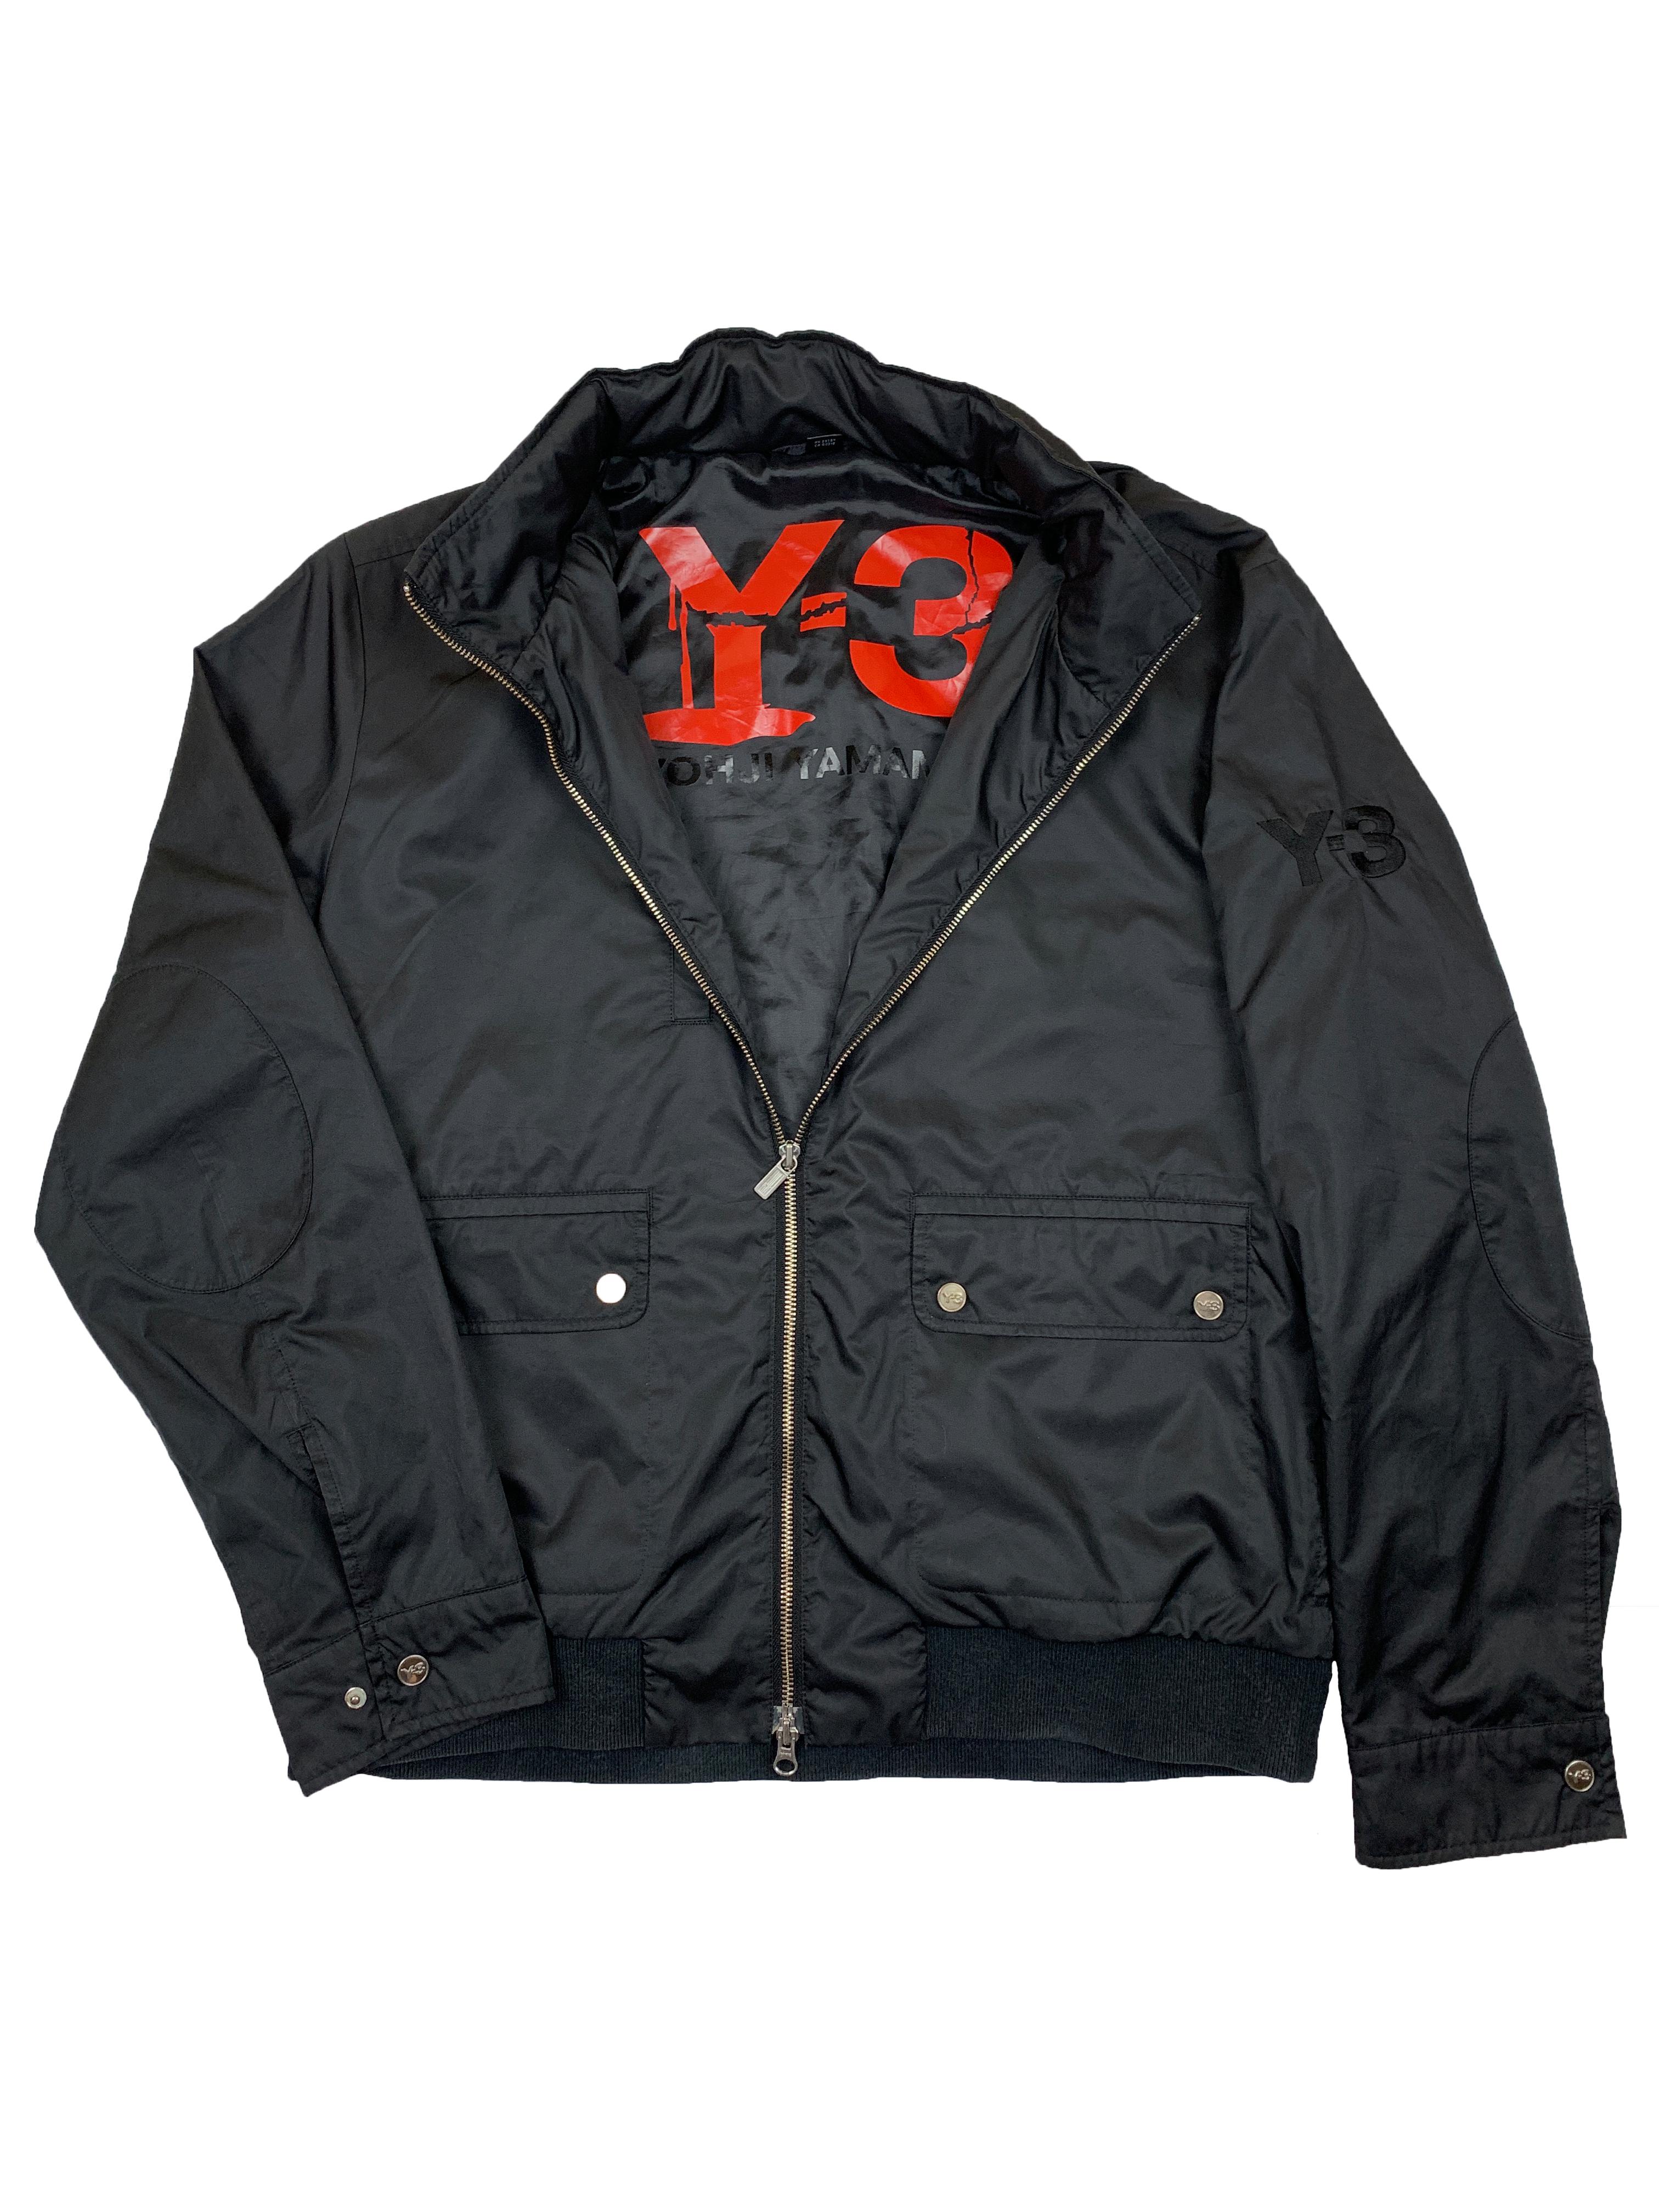 Adidas Adidas Y 3 Yohji Yamamoto Jacket Grailed